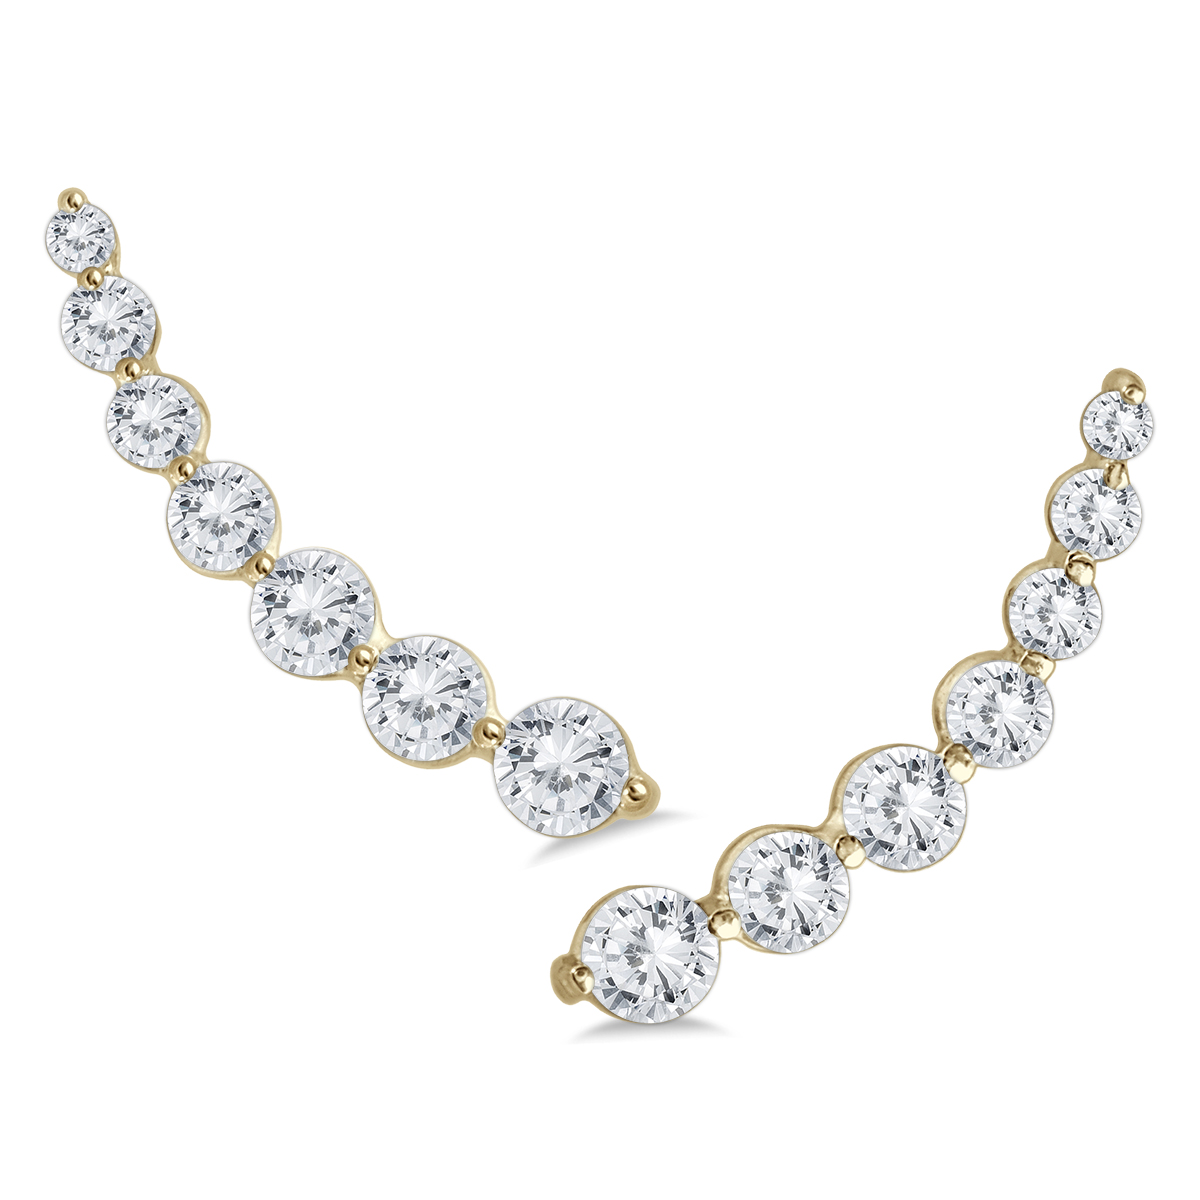 1 1/4 Carat TW Diamond Climber Earrings Set in 14K Yellow Gold